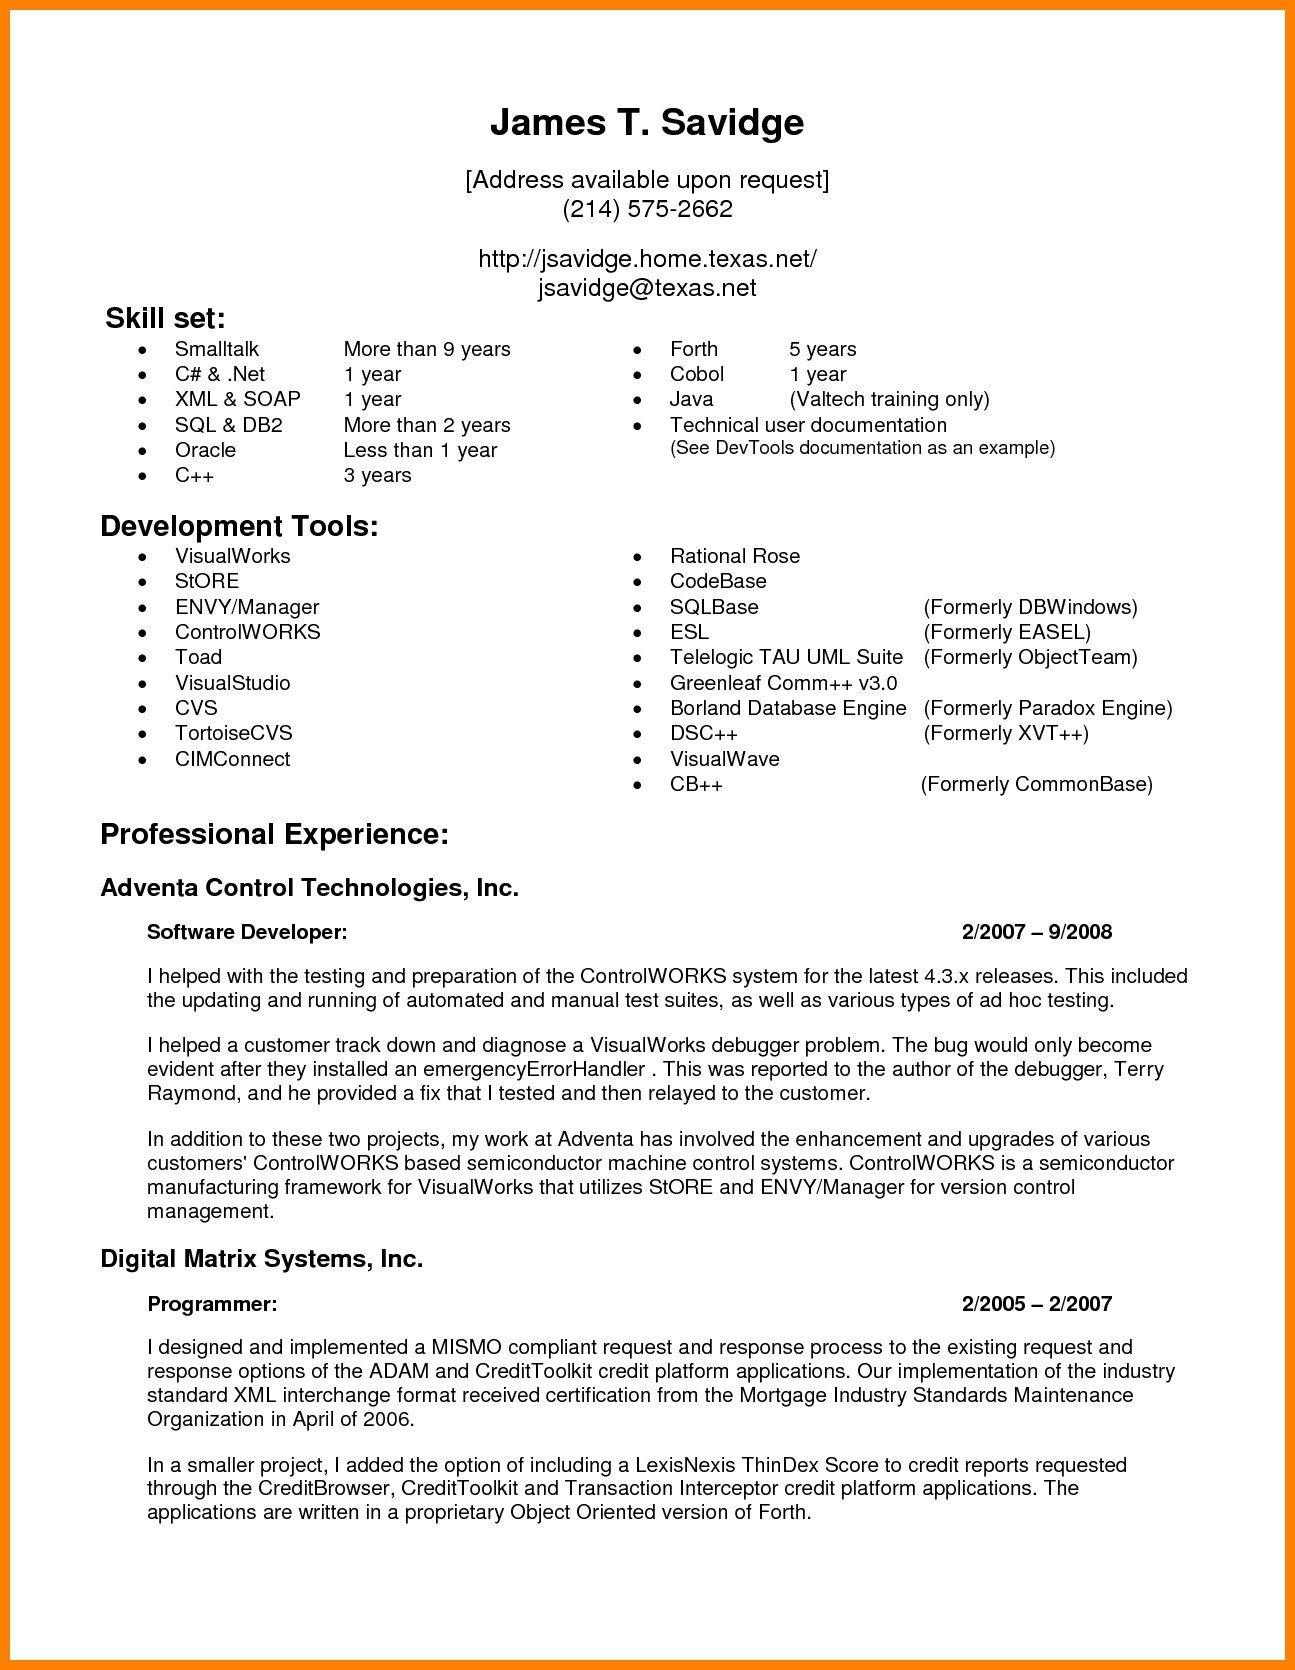 Resume Format Options Resume Format Best Resume Format Resume Examples Resume Format